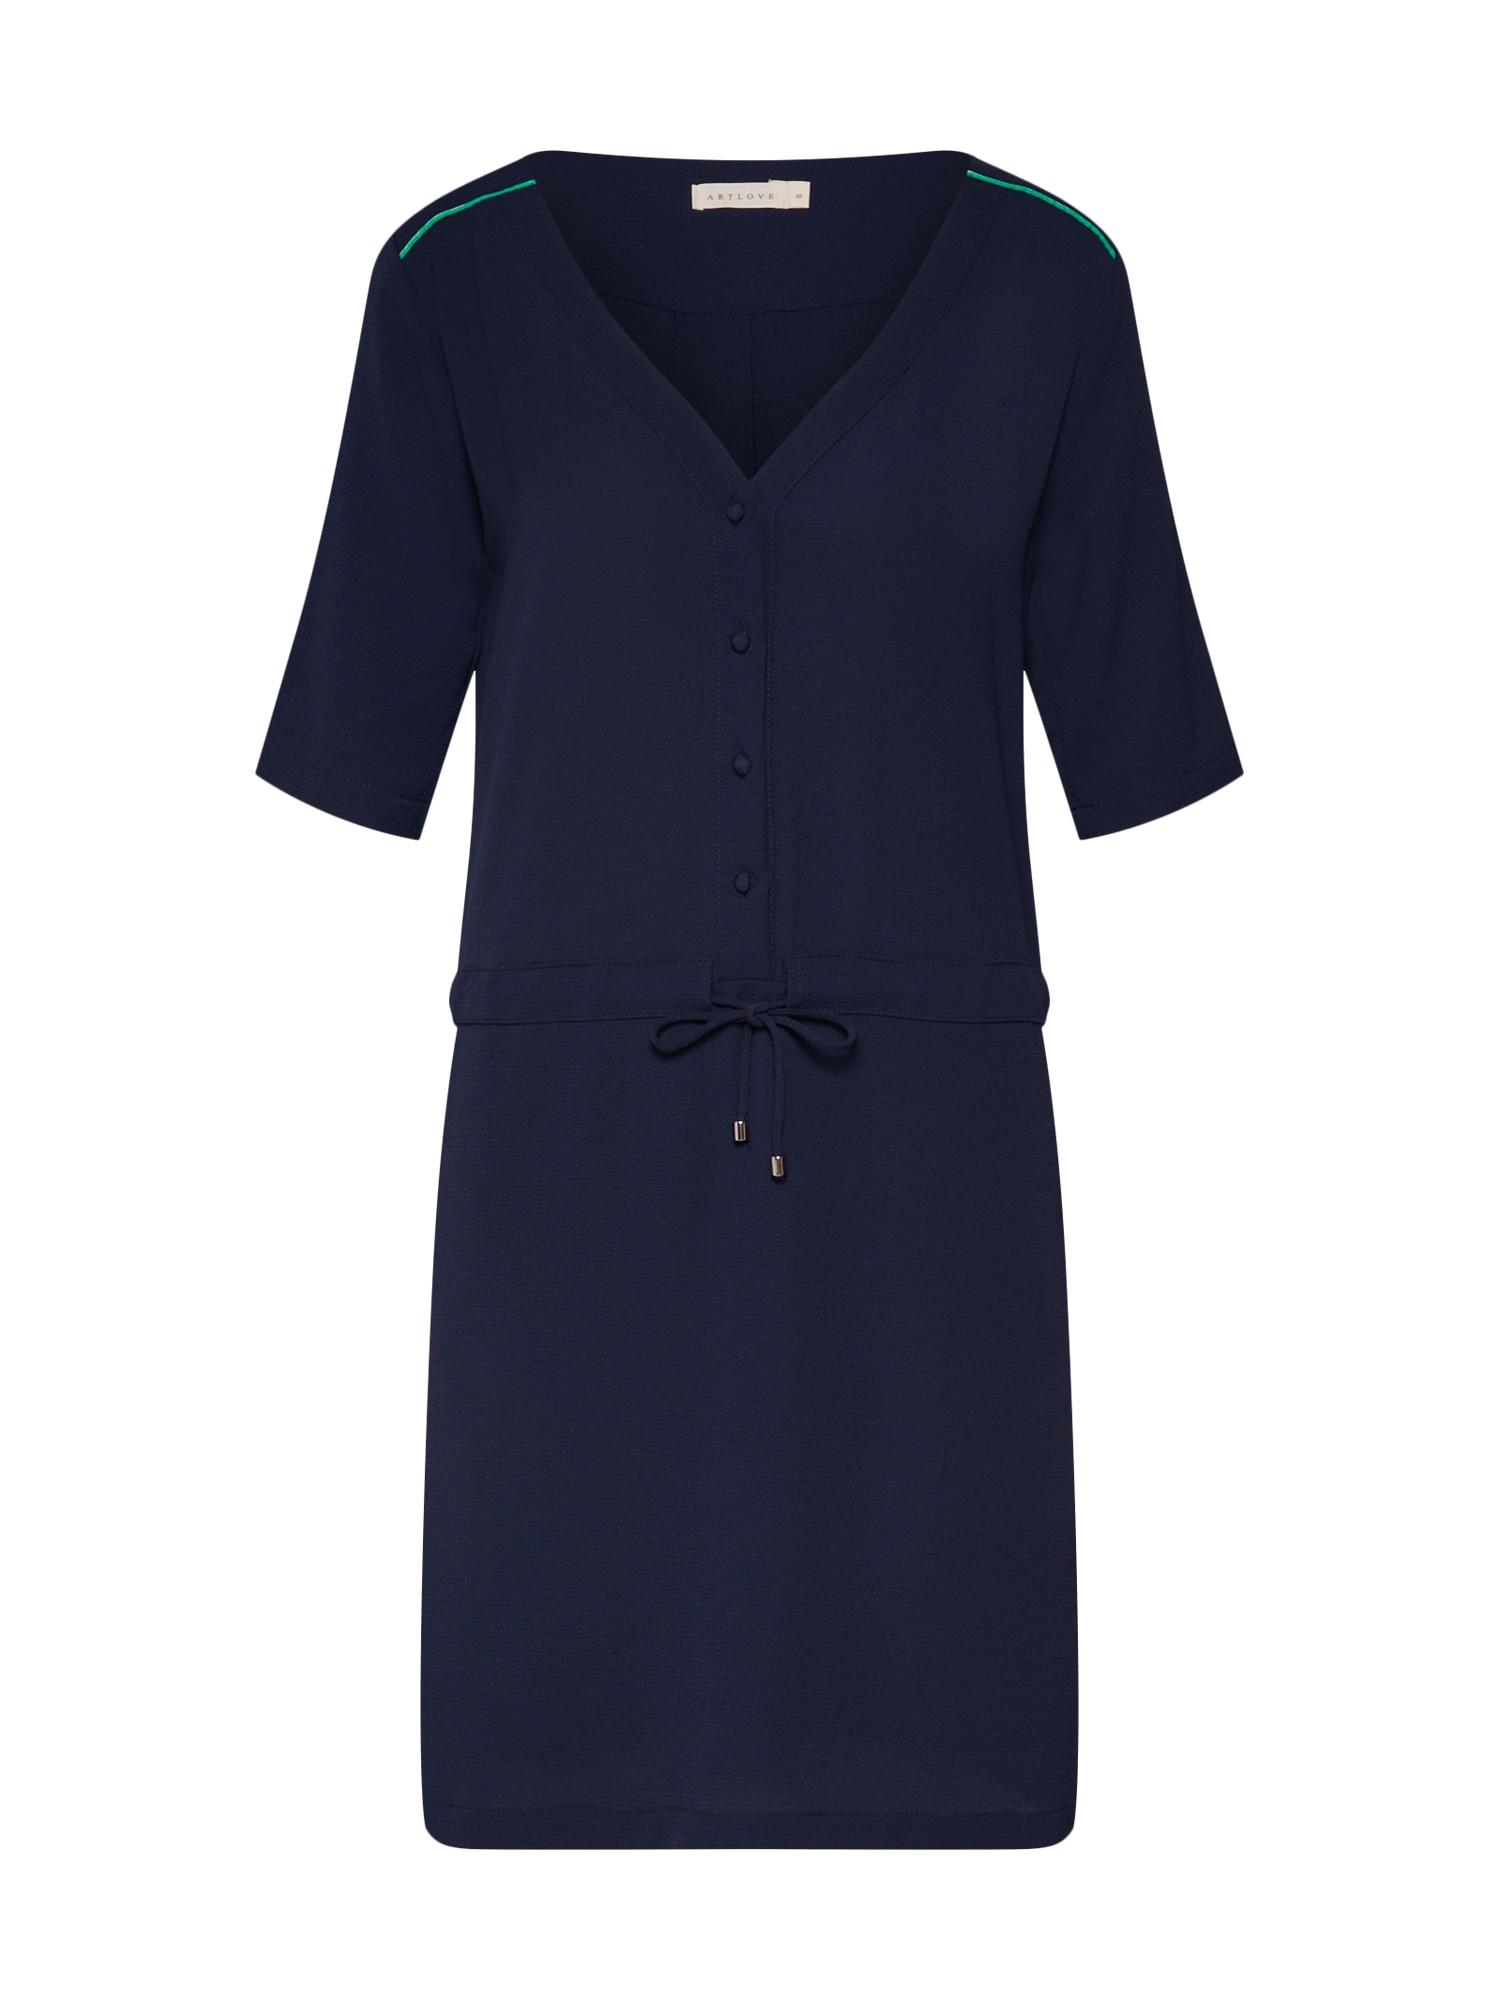 Šaty námořnická modř ARTLOVE Paris